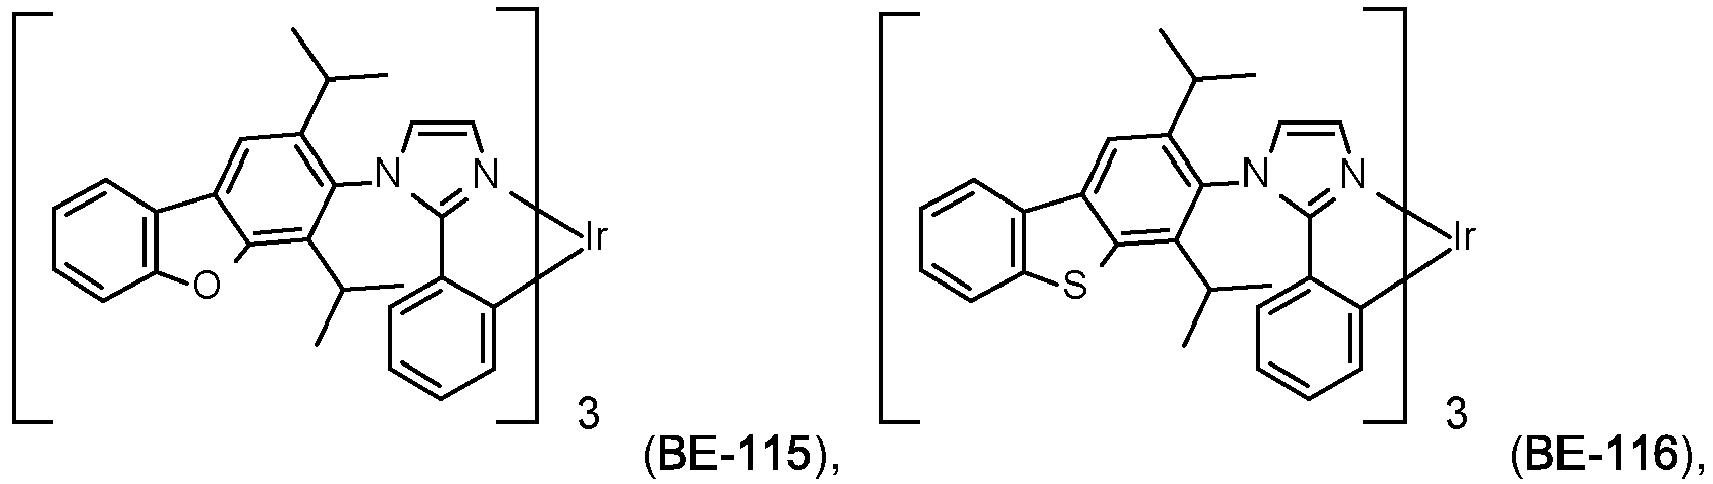 Figure imgb0804